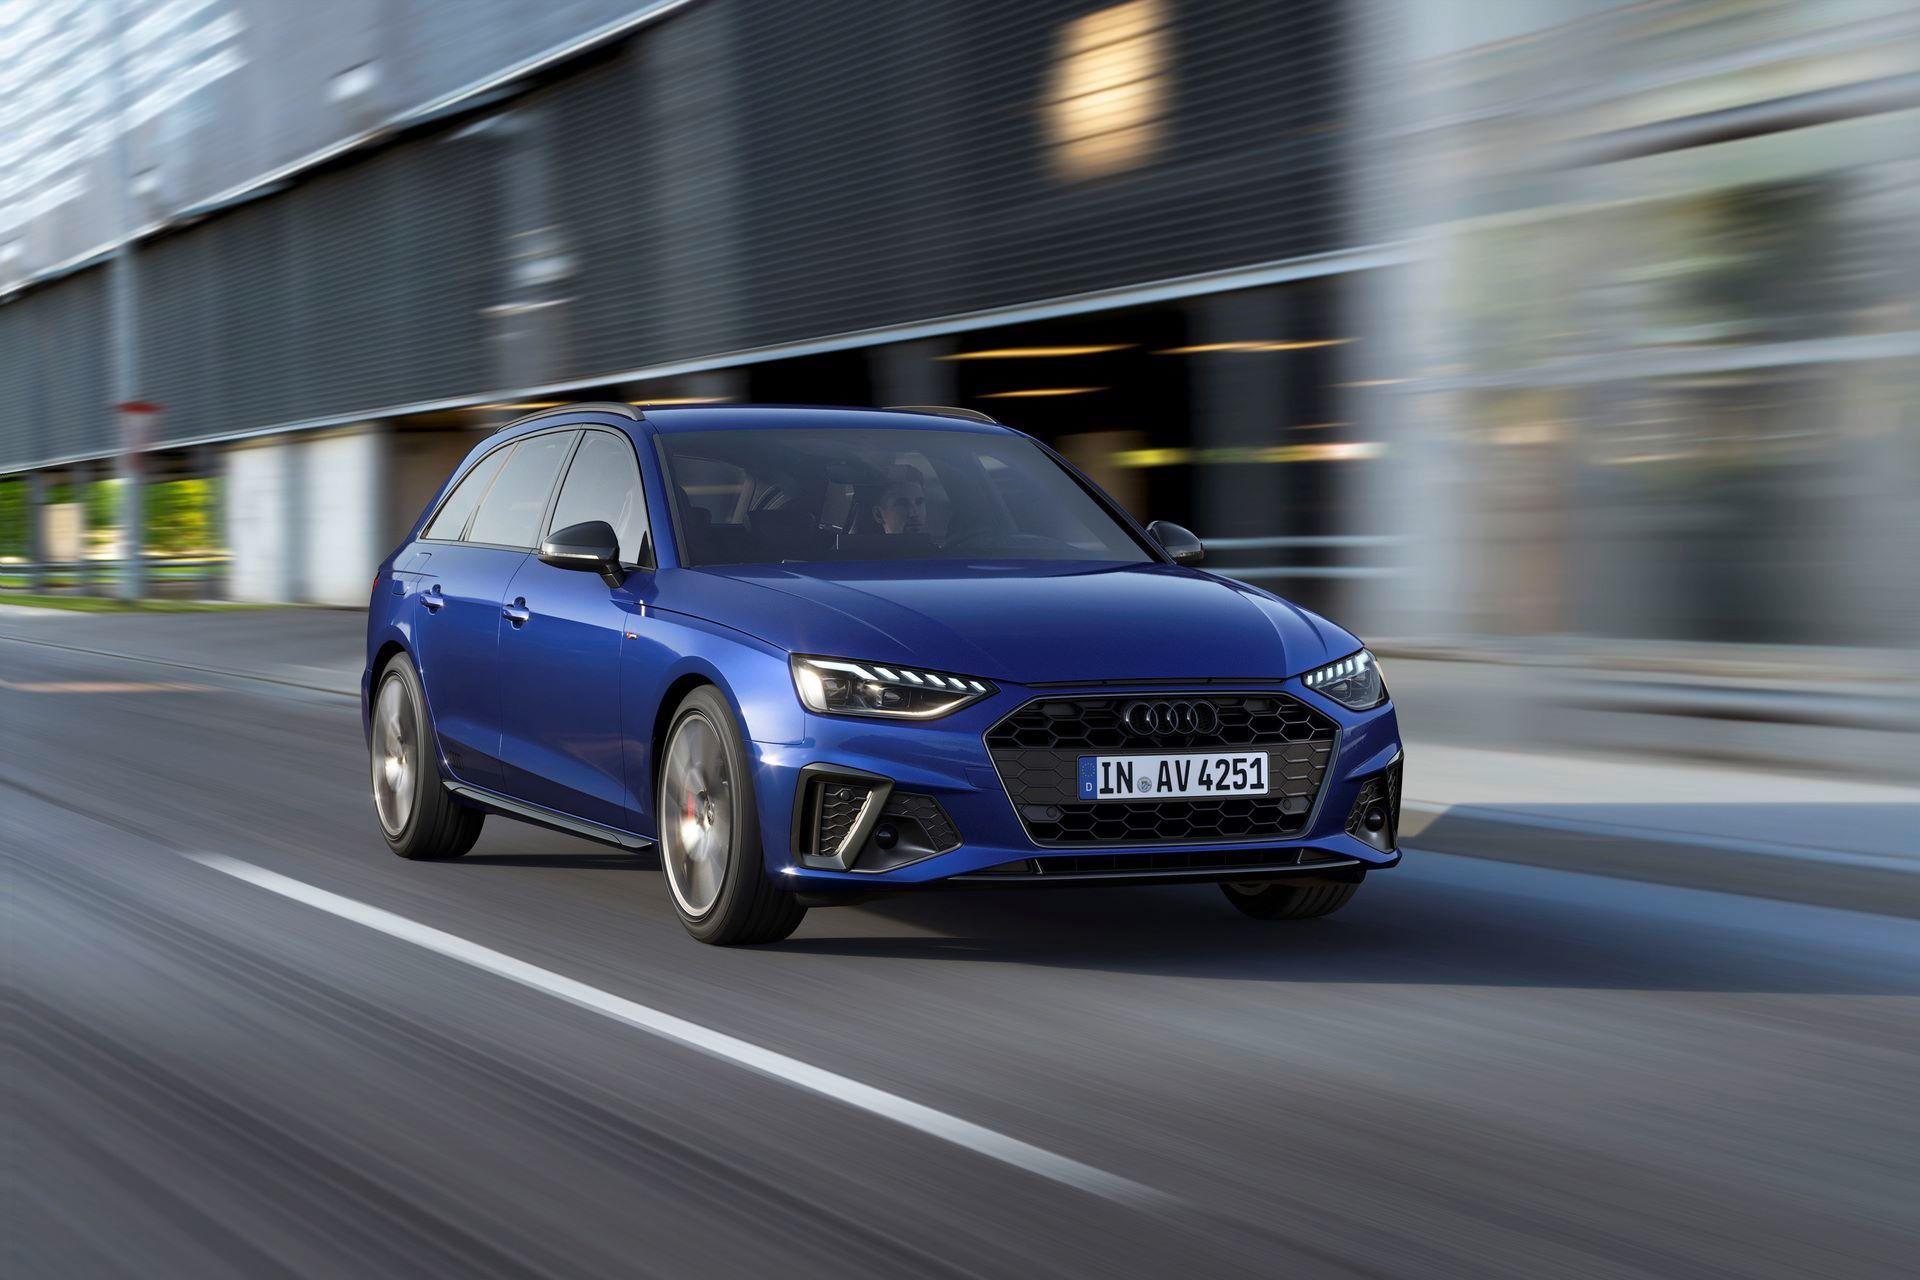 Audi-A4-A5-Q7-Q8-Competition-And-Competition-Plus-Trims-57